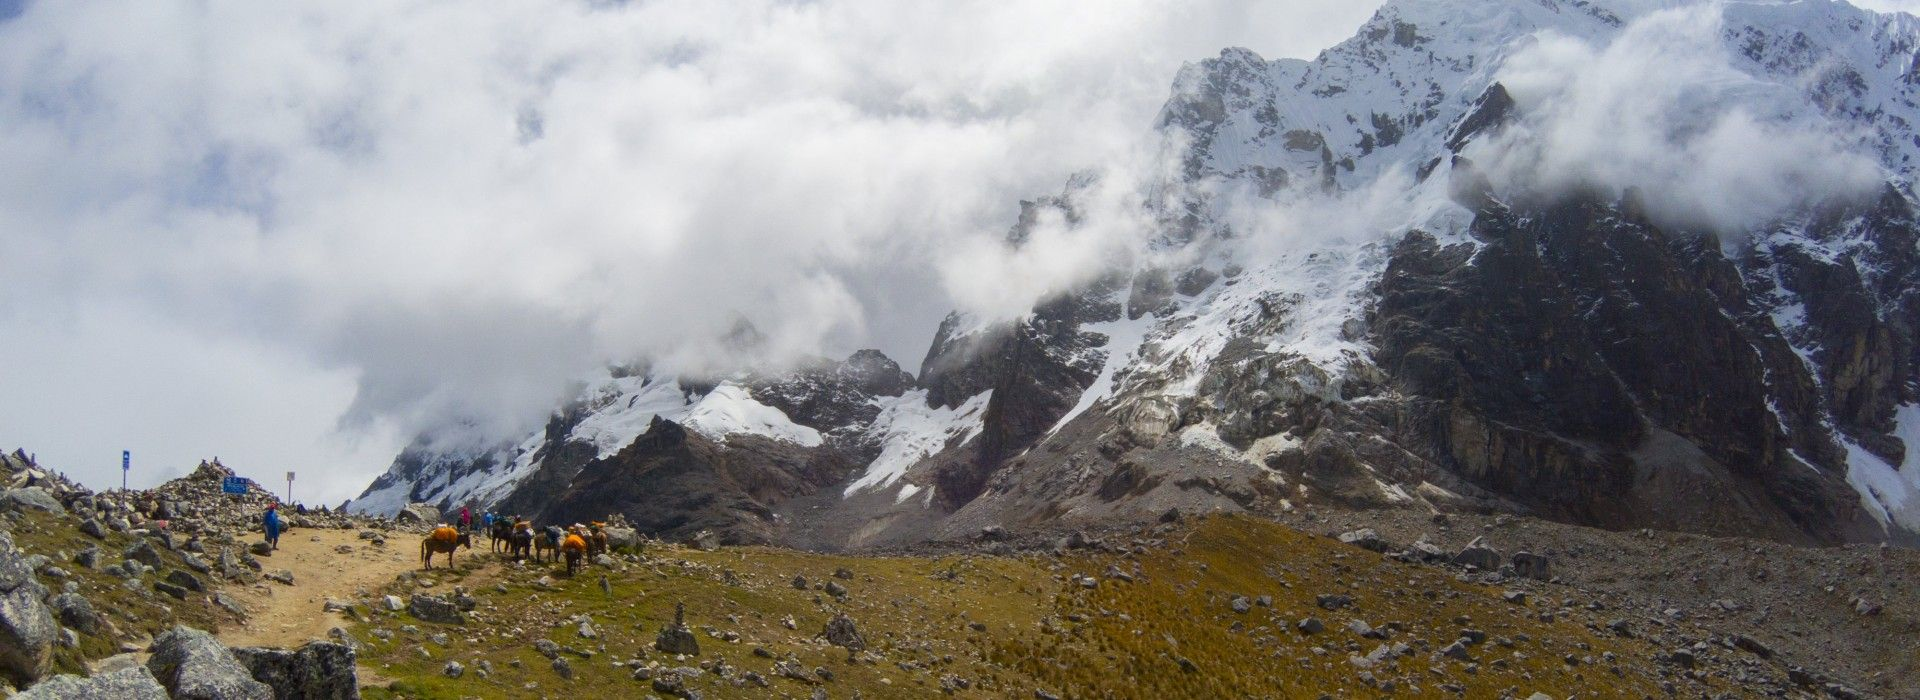 Adventure and sport activities Tours in Cusco